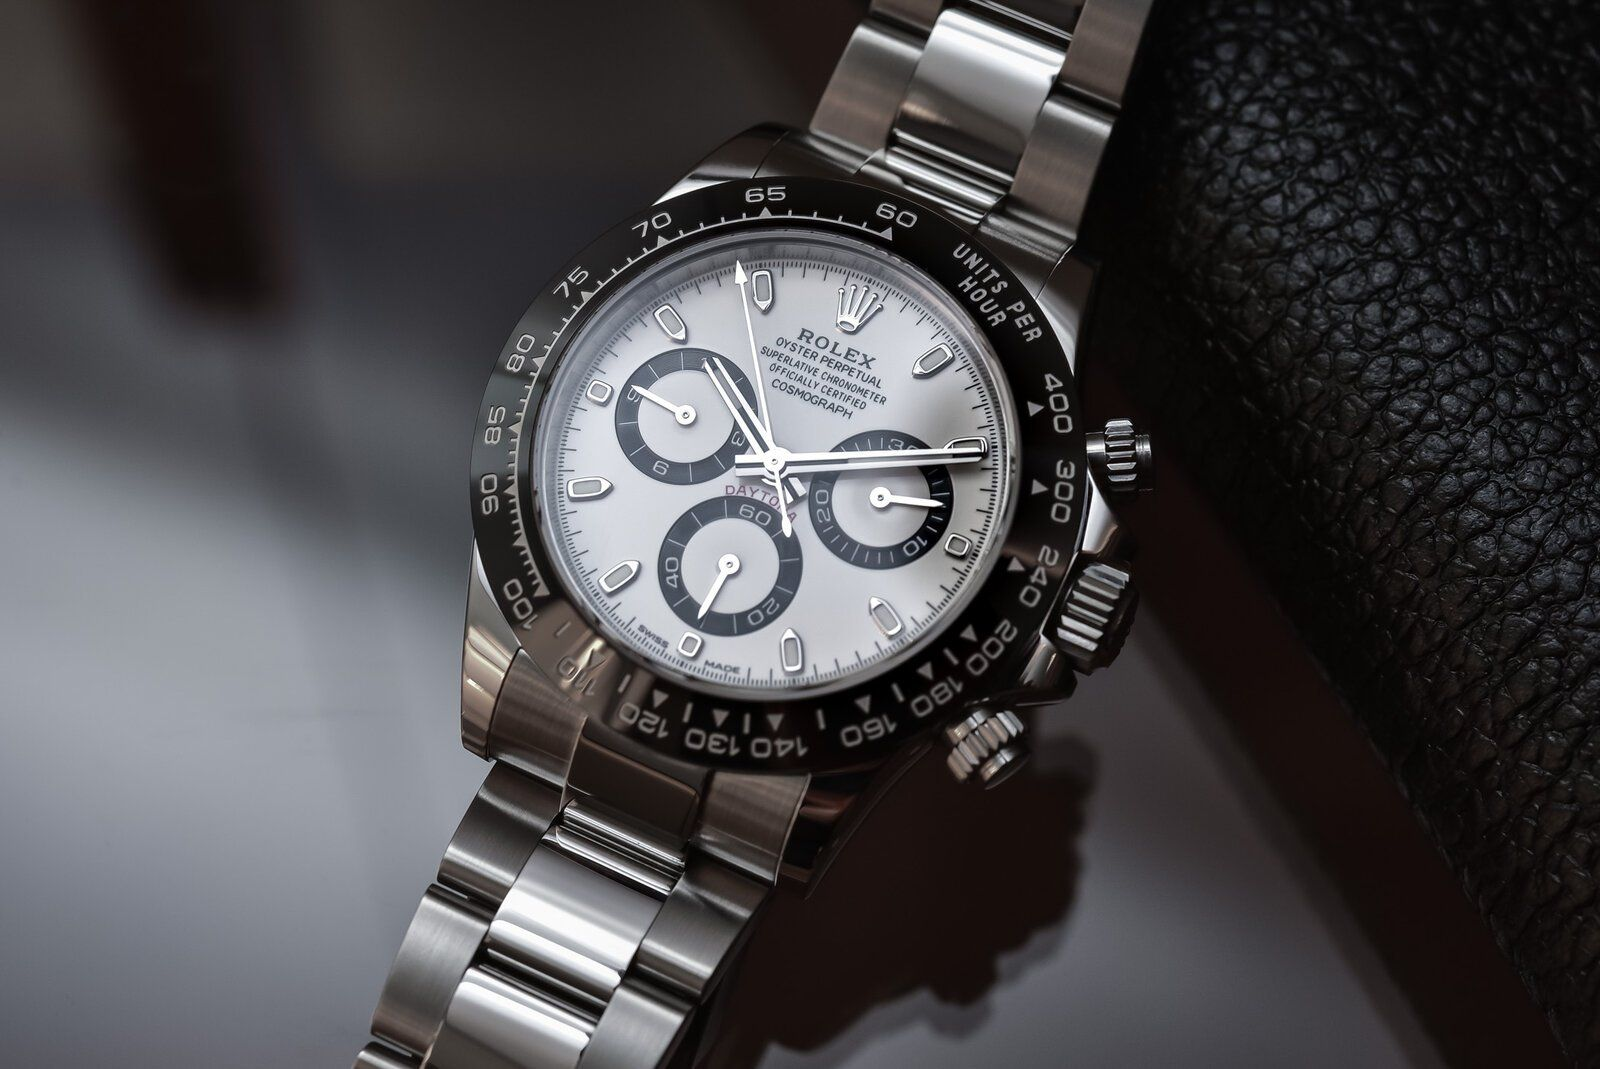 Rolex-Daytona-116500LN-Market-analysis-continuous-and-insane-rise-price-2.jpg